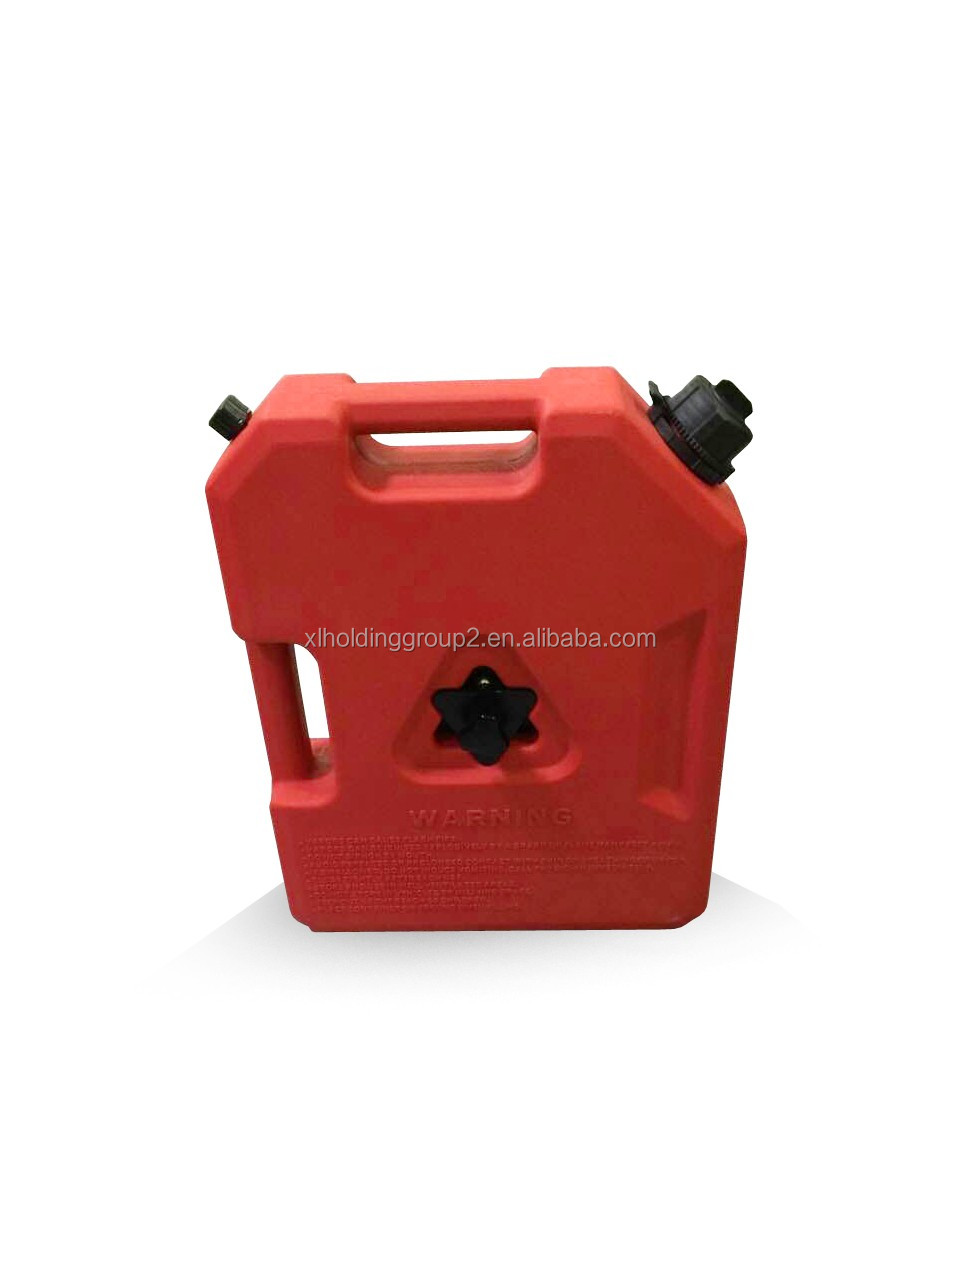 spare gas tank for jeep wrangler jk buy gas tank gas tank for jeep wrangler jeep wrangler gas. Black Bedroom Furniture Sets. Home Design Ideas